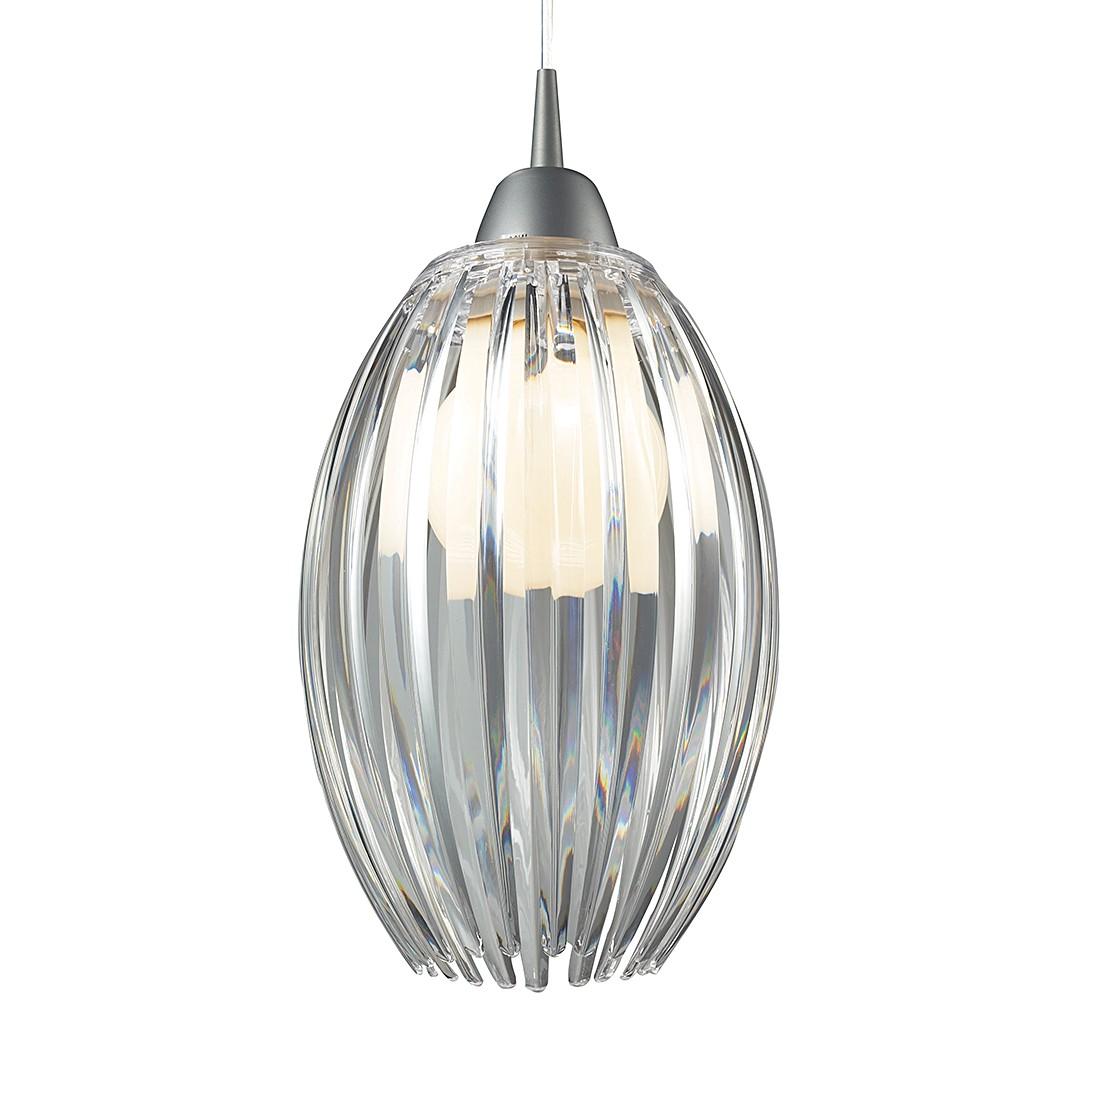 pendelleuchte acrylic 1 flammig economic lighting a online bestellen. Black Bedroom Furniture Sets. Home Design Ideas